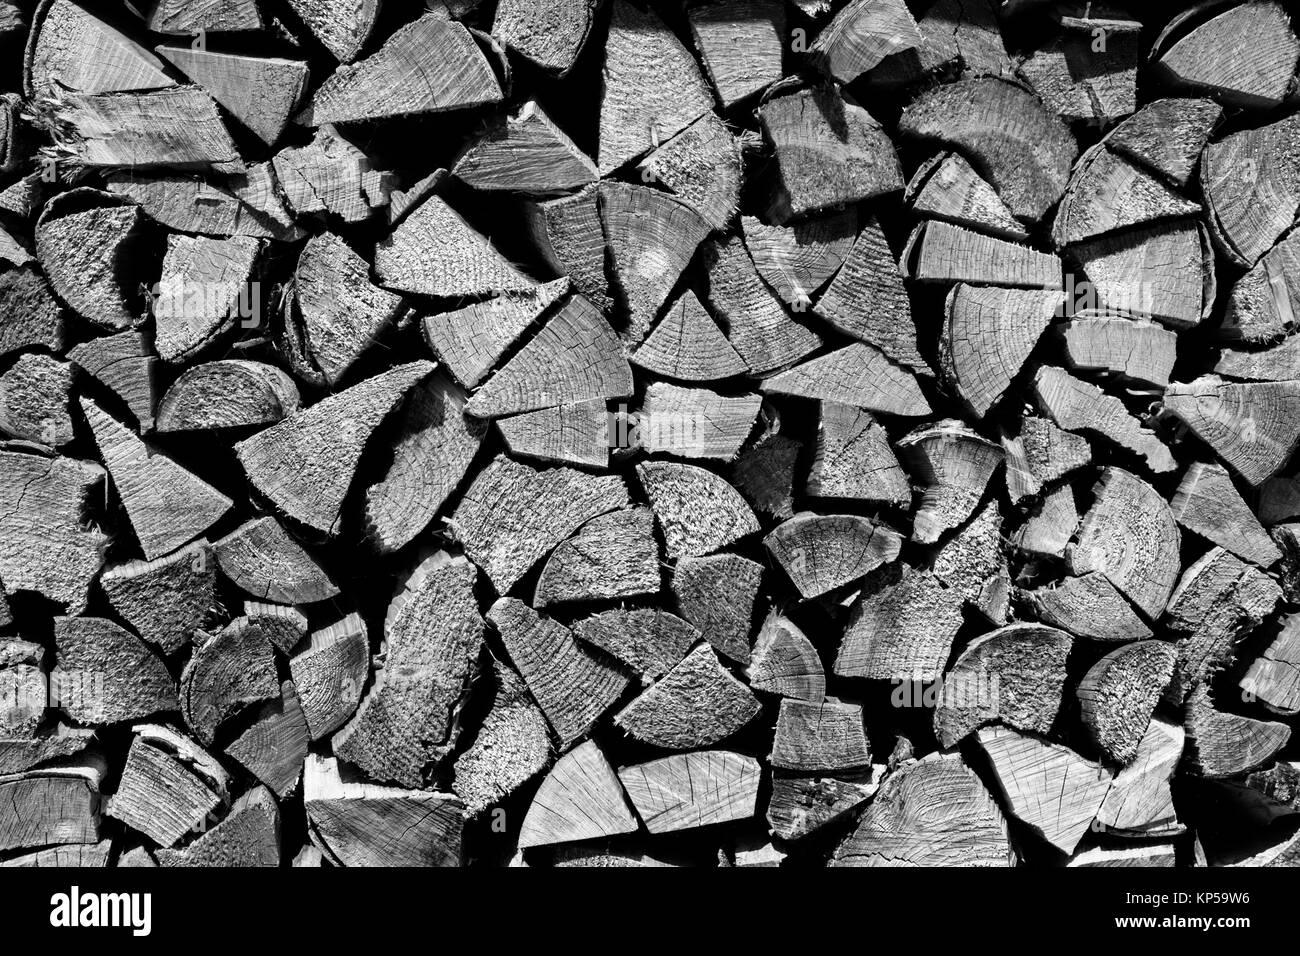 firewood,chiemgau,bayern,germany - Stock Image